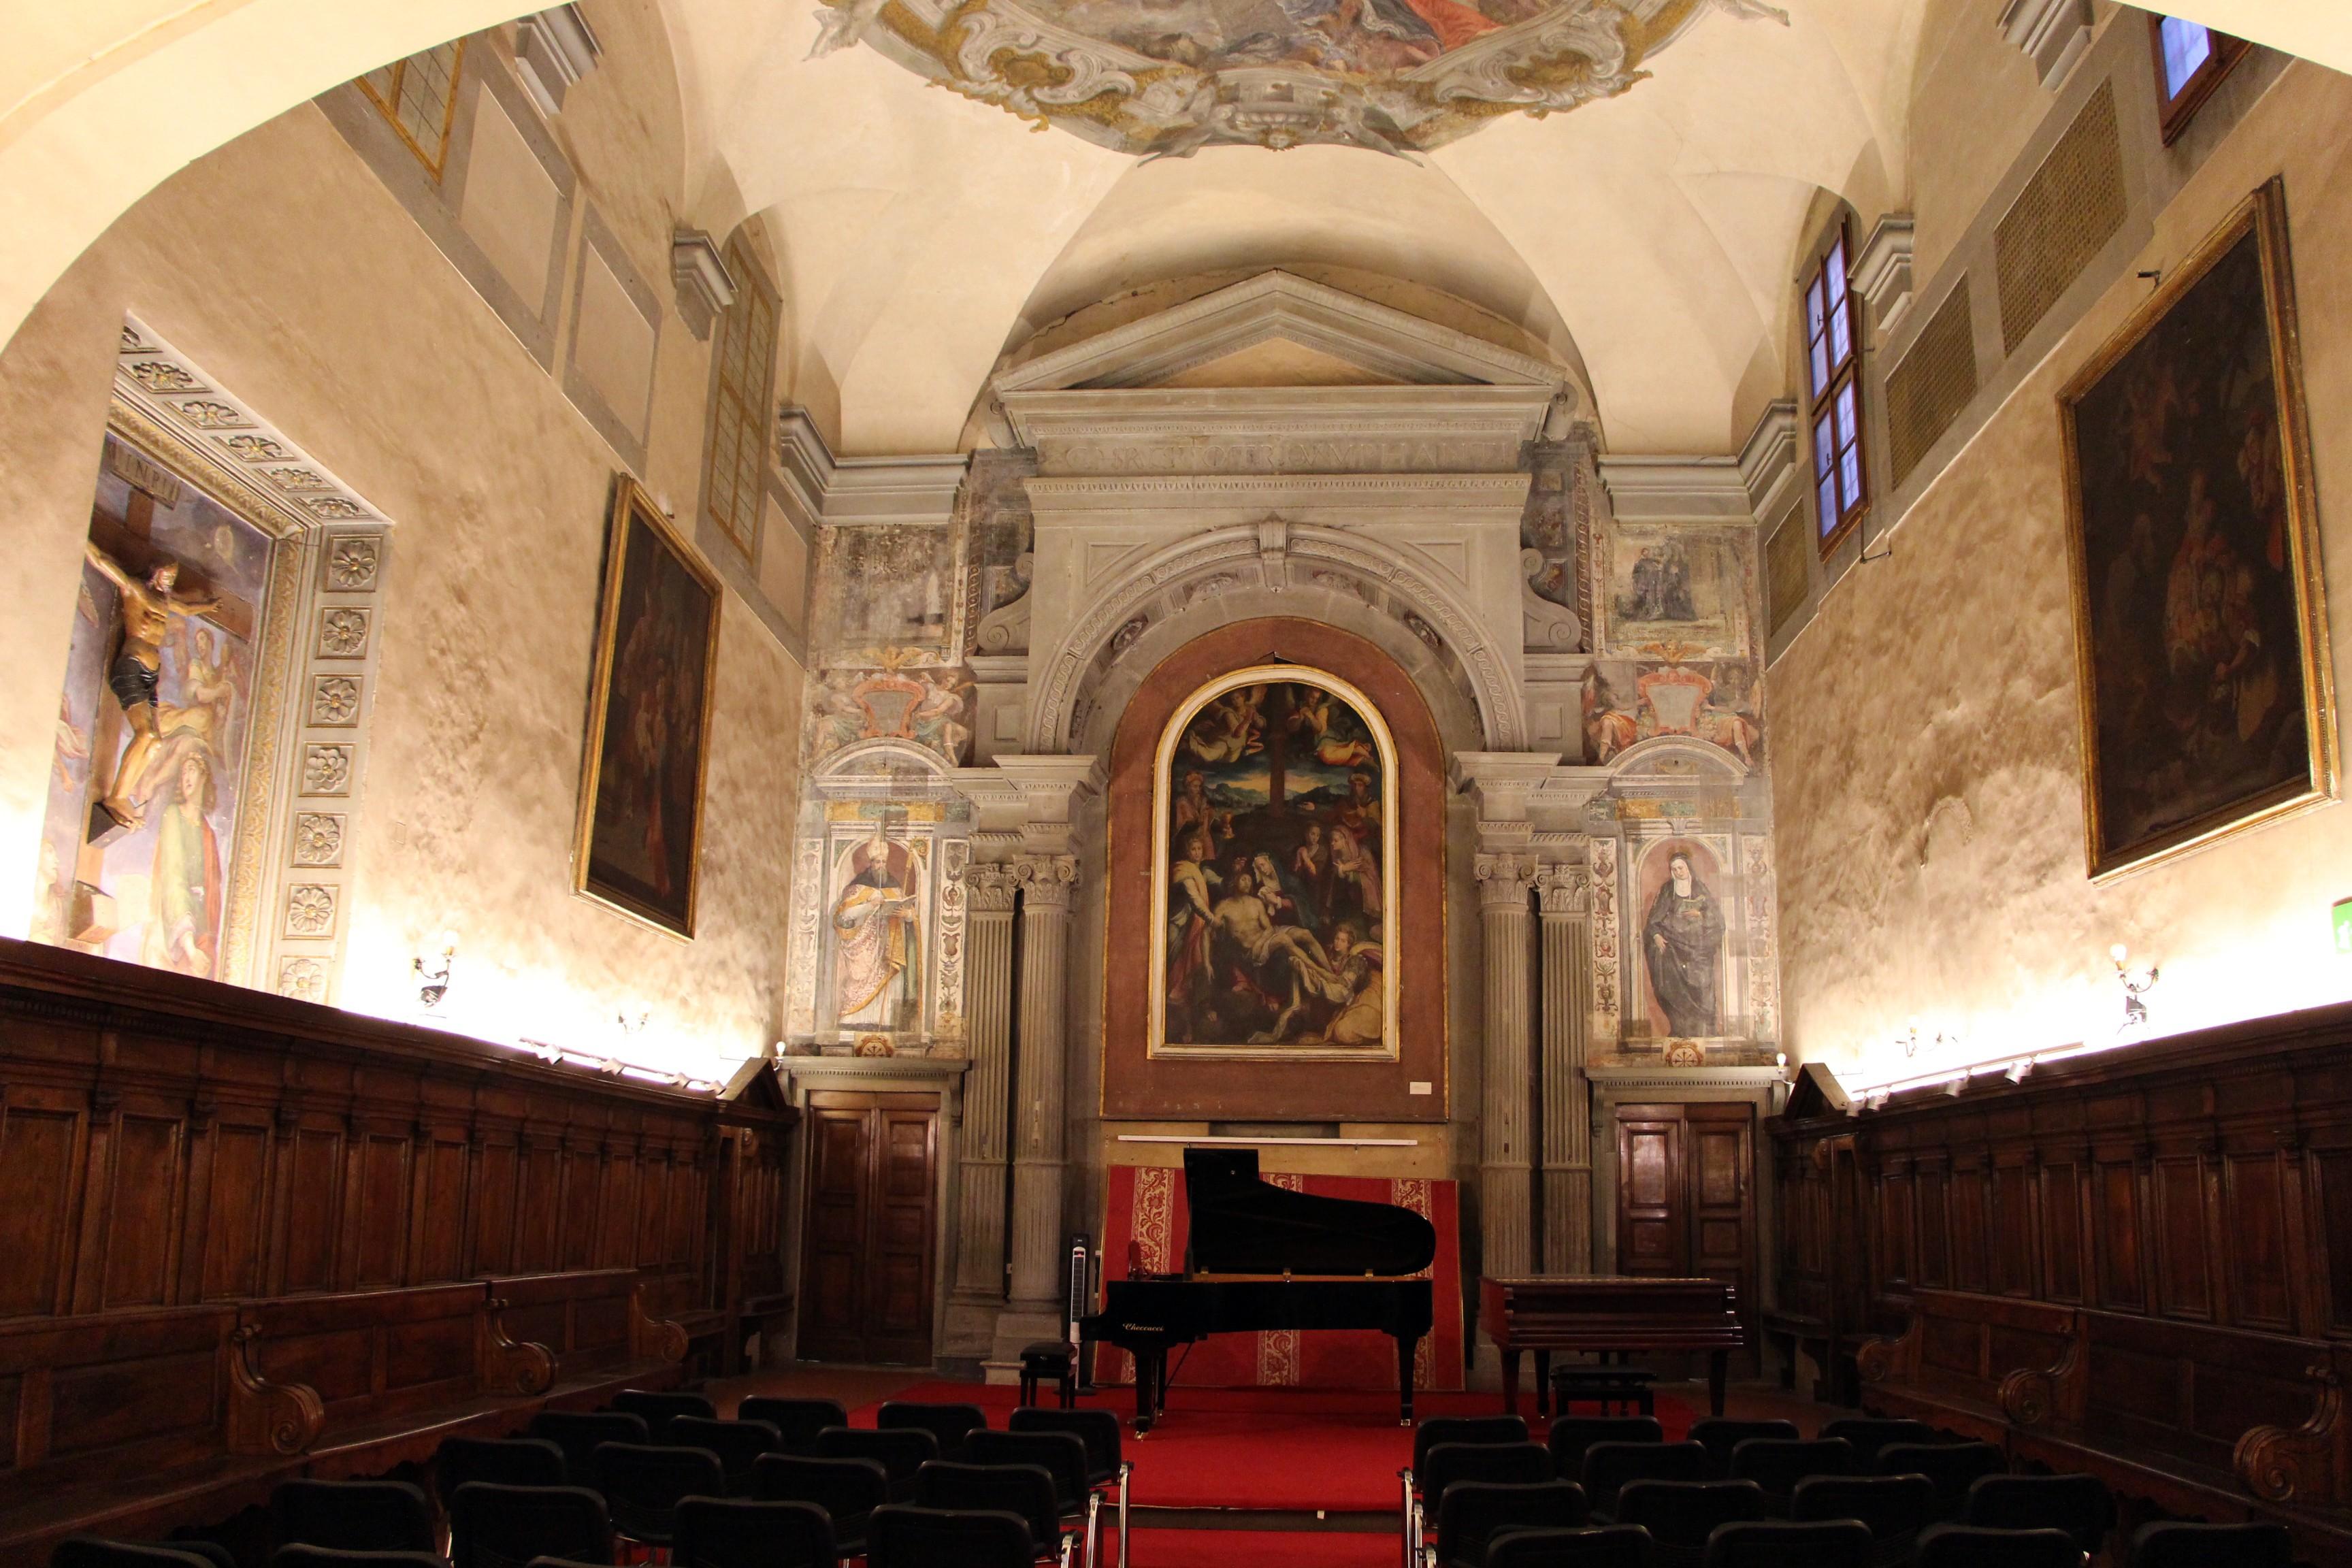 Chiesa di Santa Monaca, Florence: All year